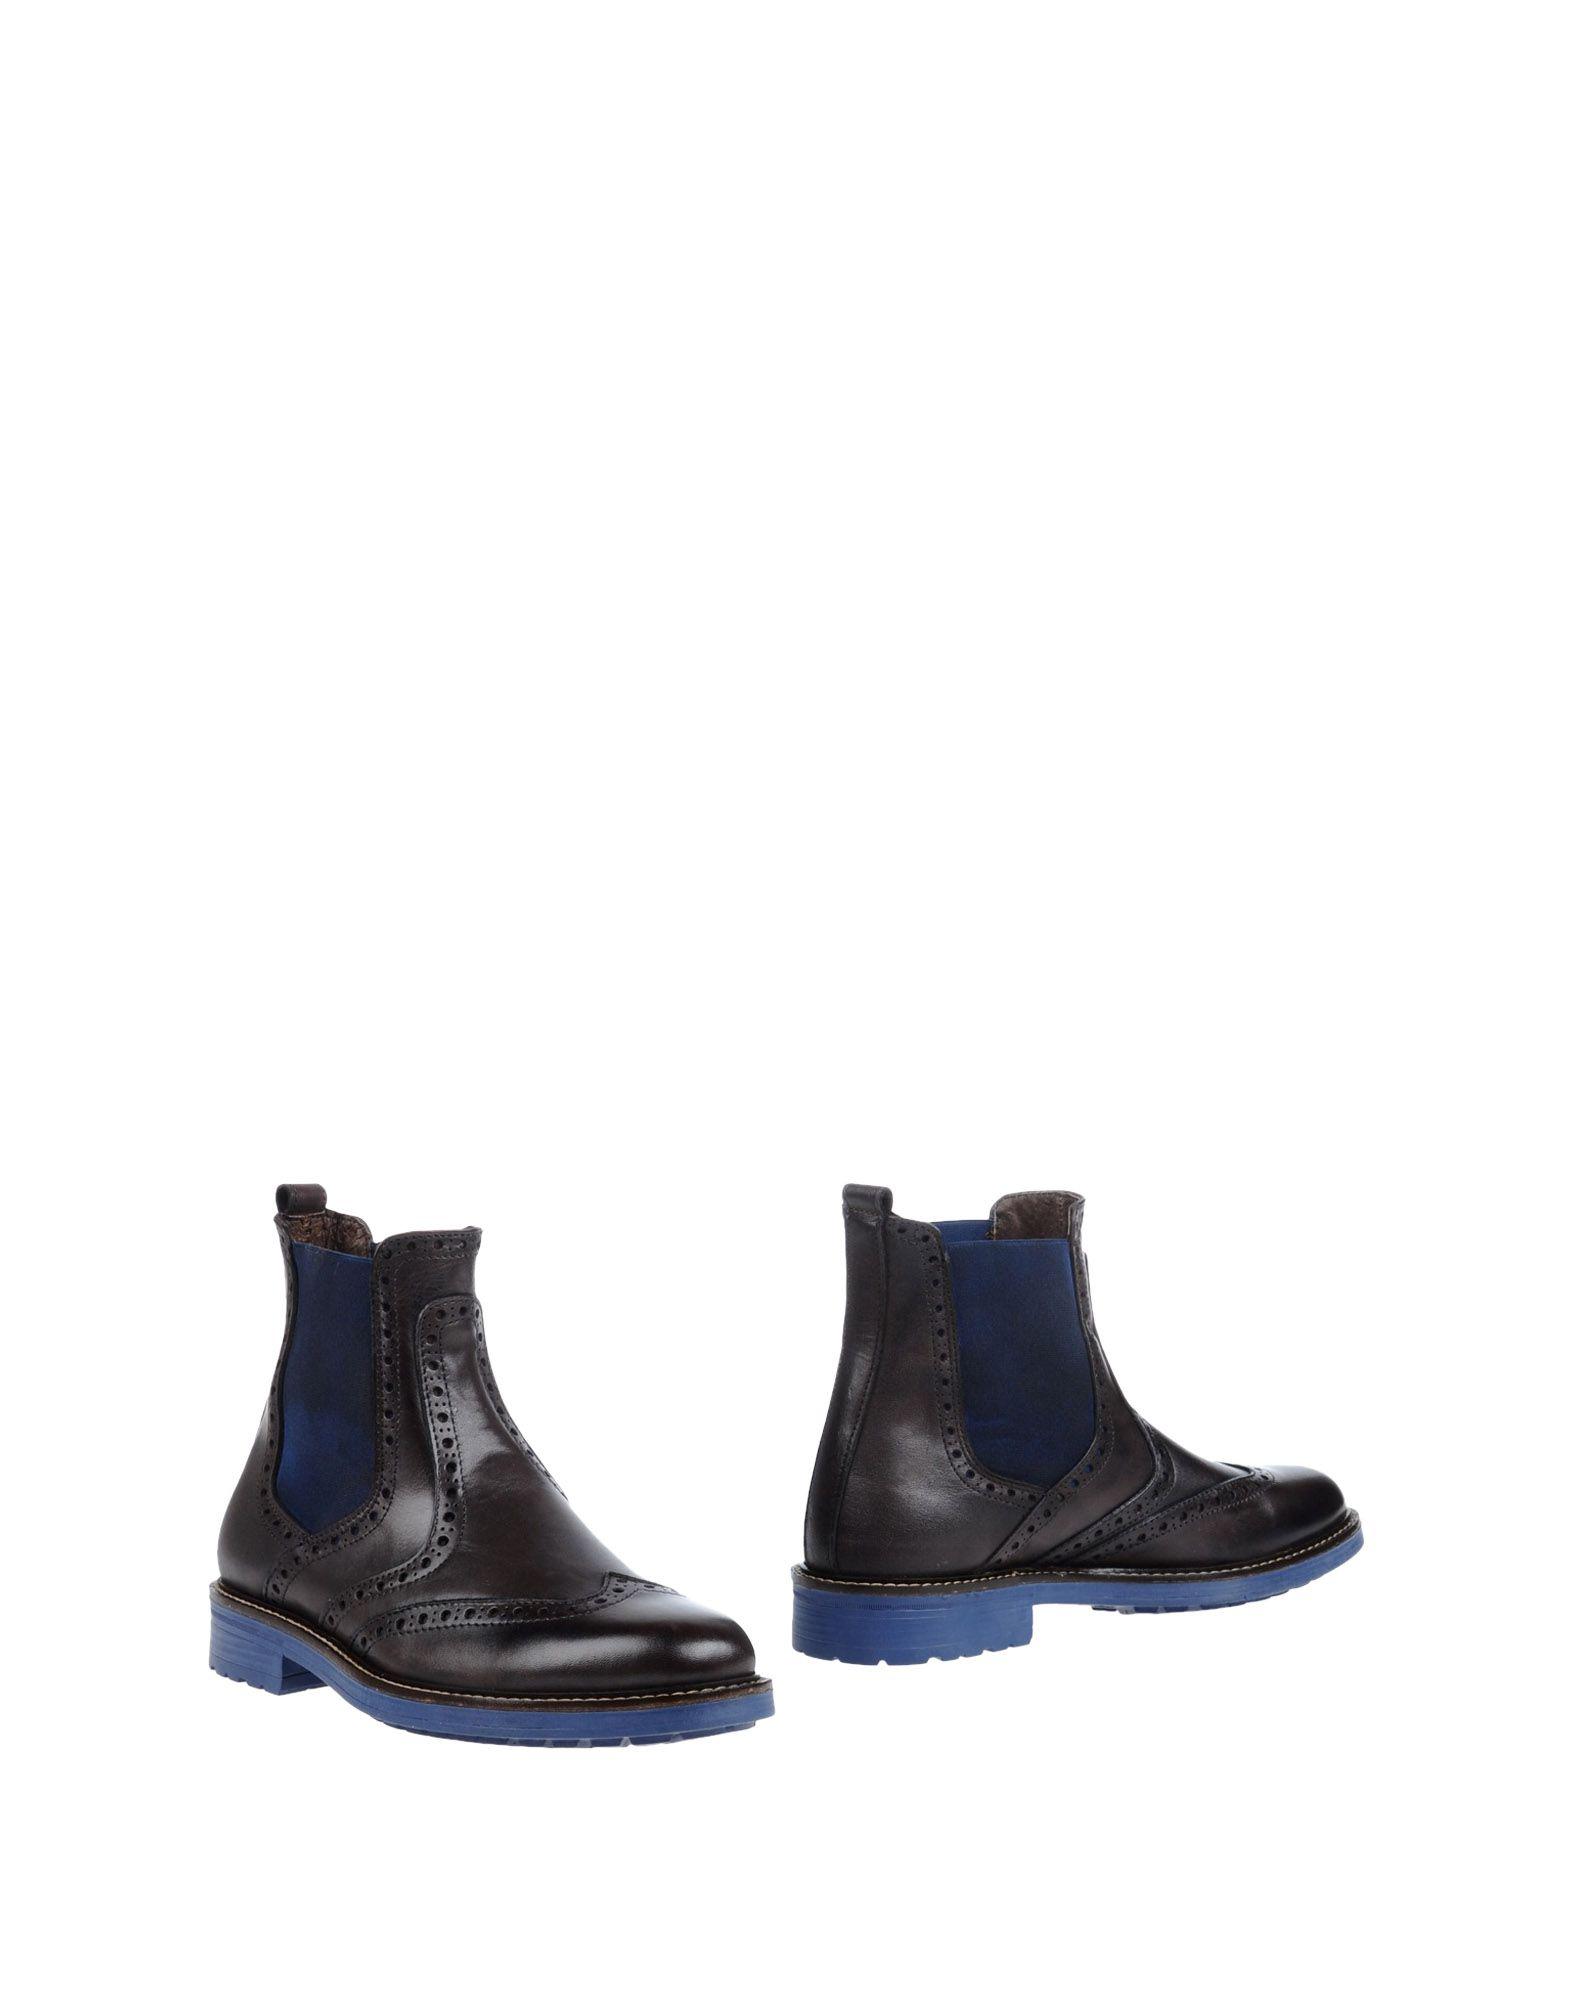 CAFèNOIR Полусапоги и высокие ботинки tatoosh полусапоги и высокие ботинки